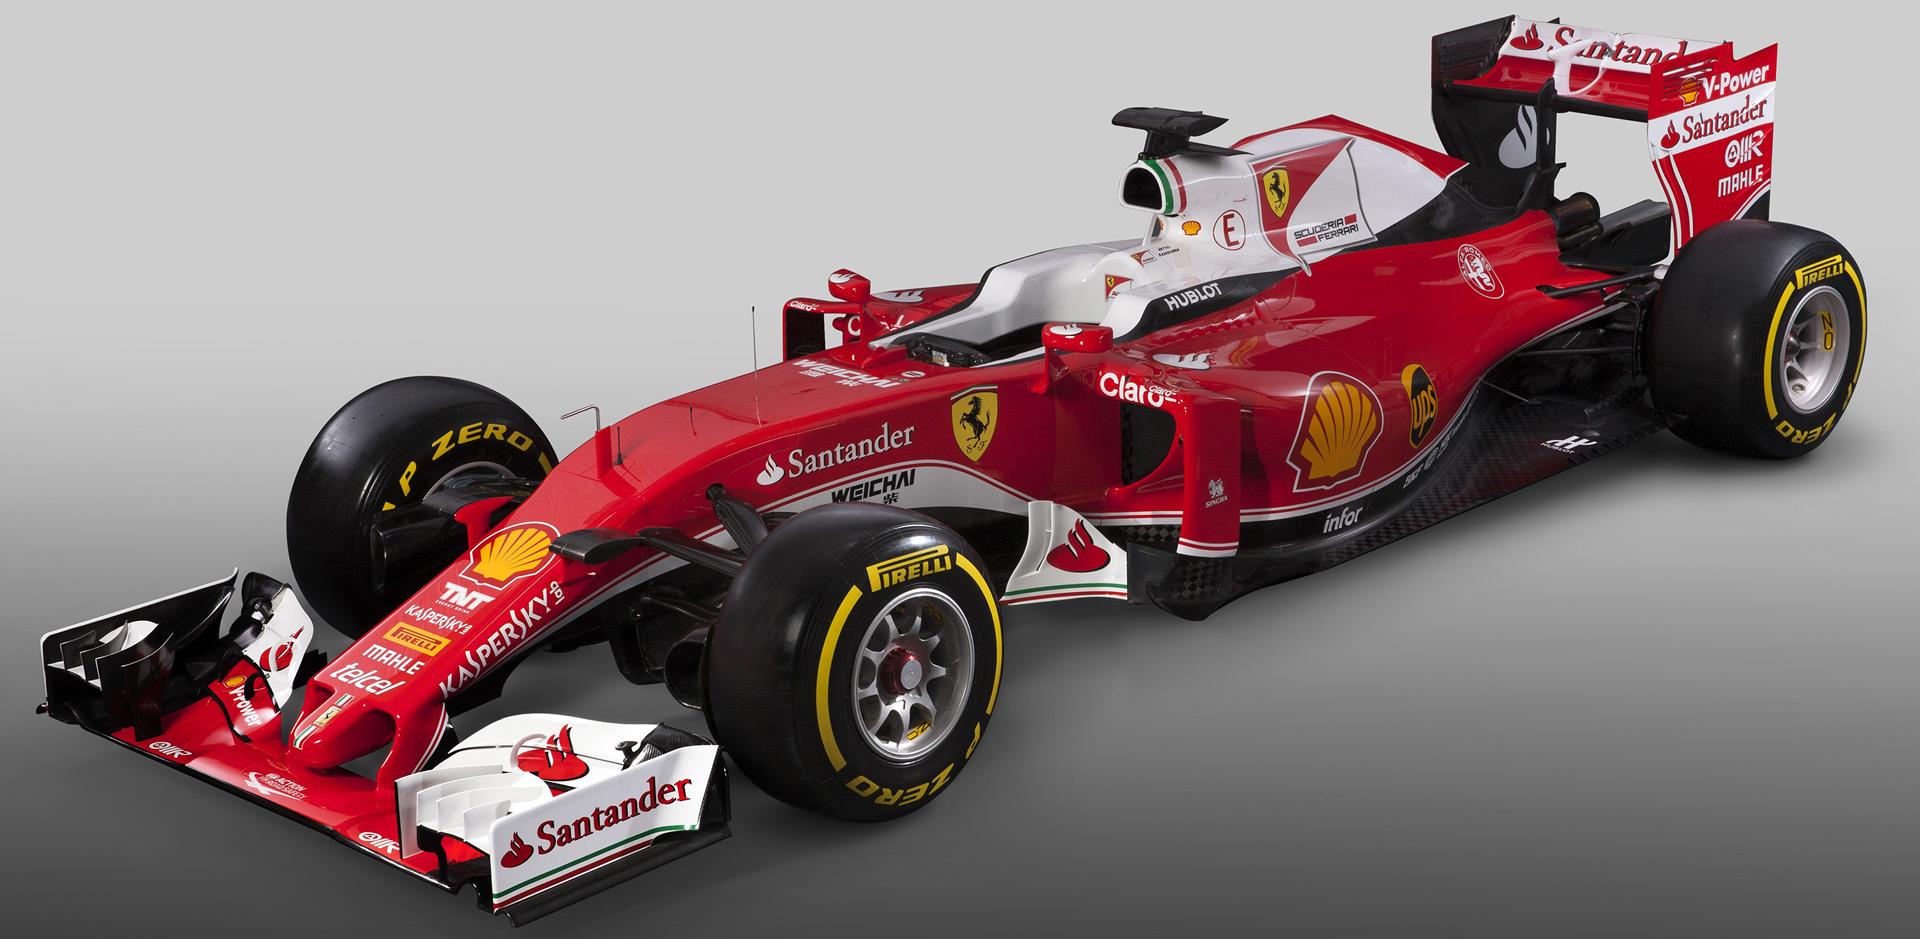 Ferrari's race car for the 2016 F1 season is the SF16-H